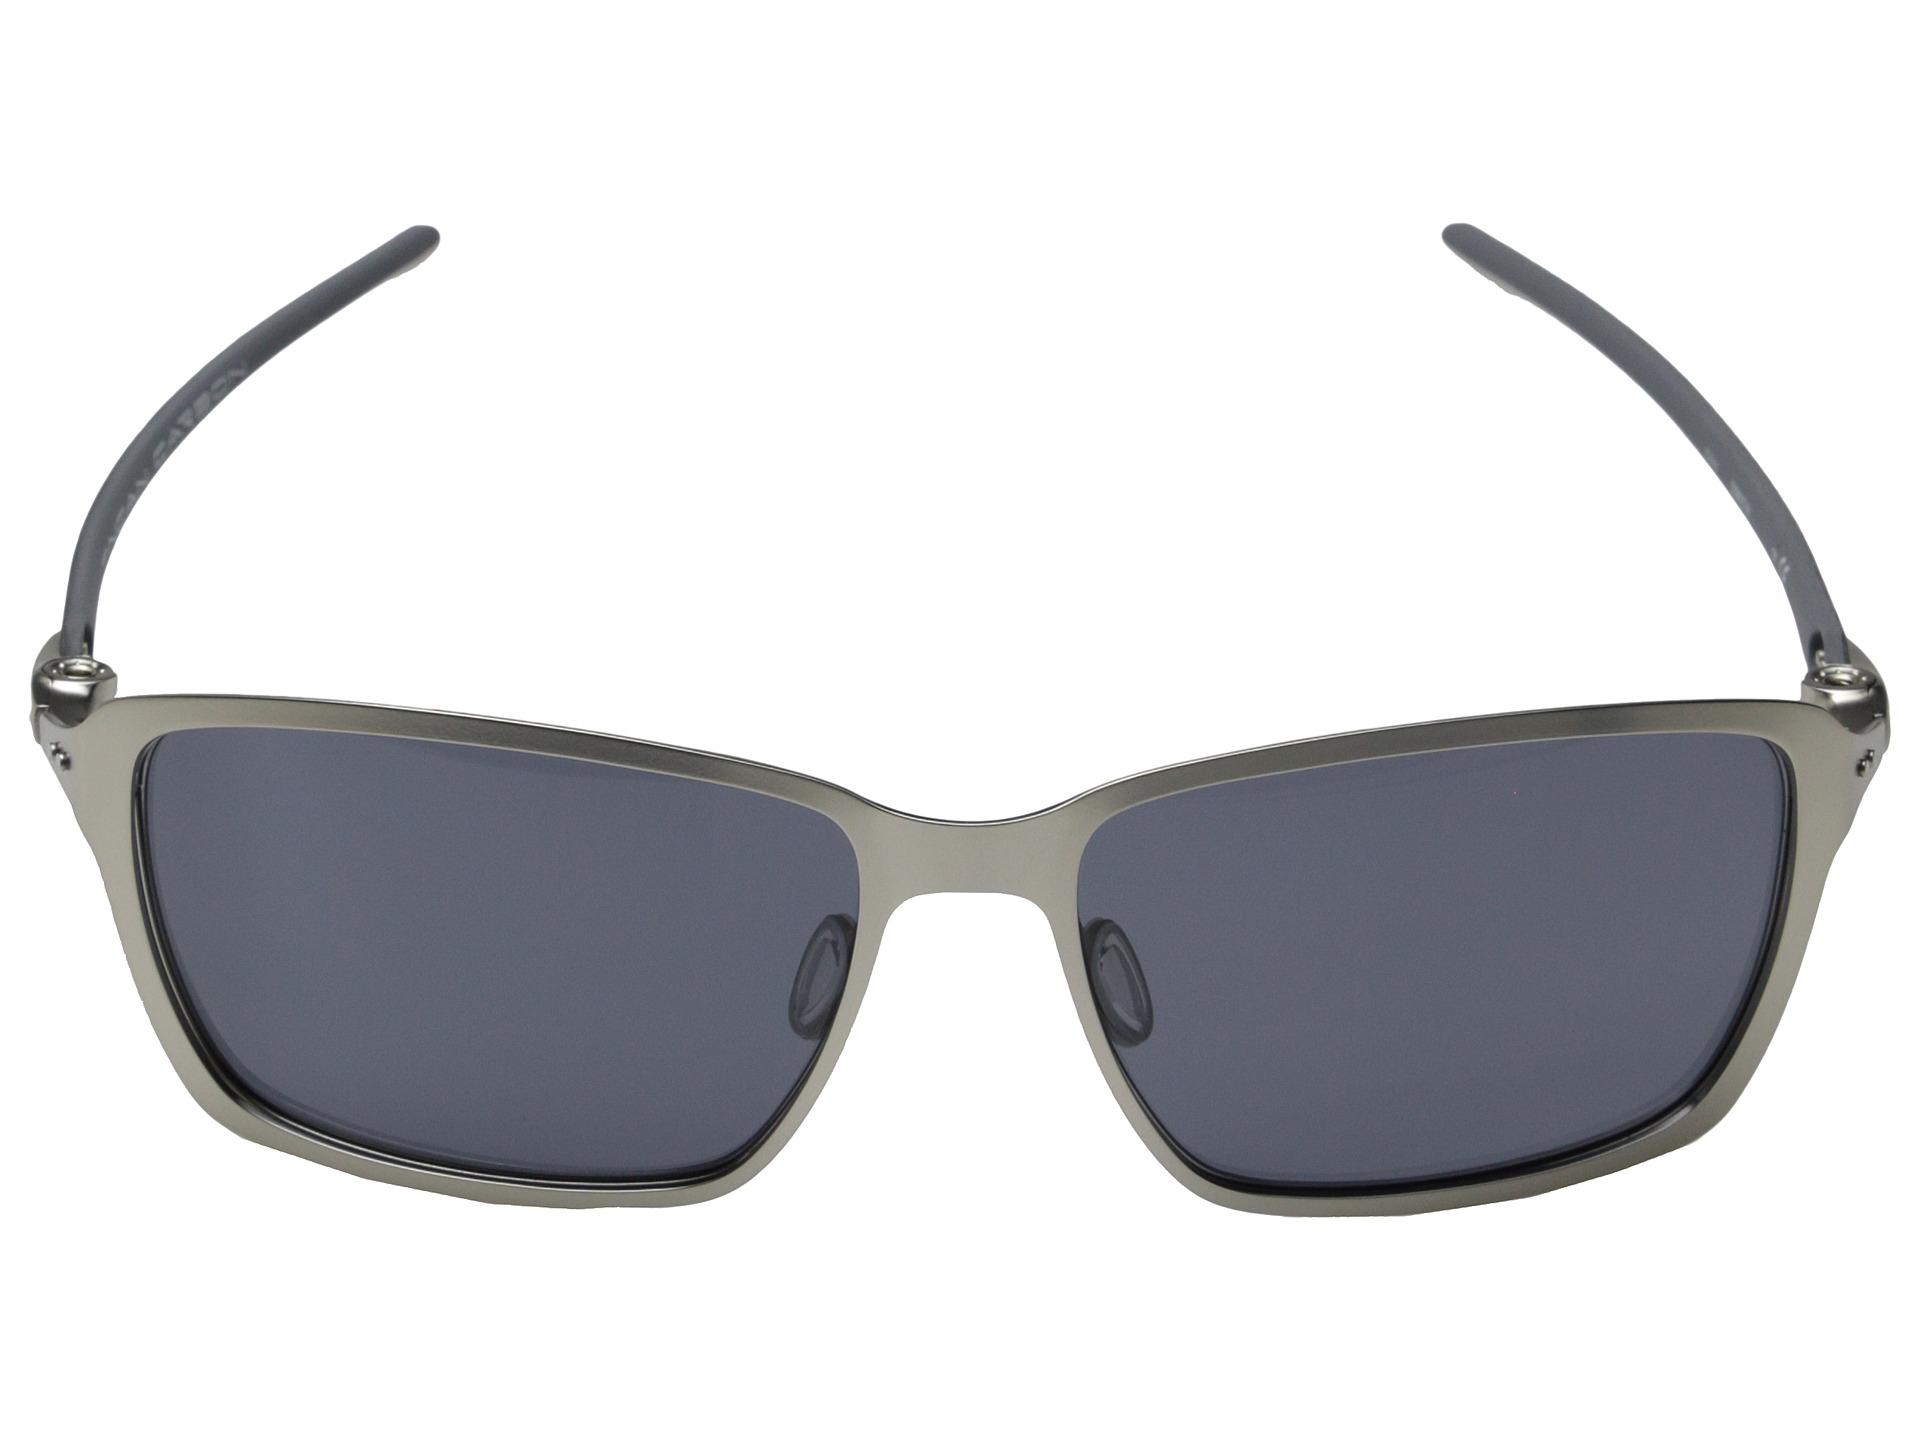 27b9e6fc40 Lyst - Oakley Tincan Carbon in Gray for Men